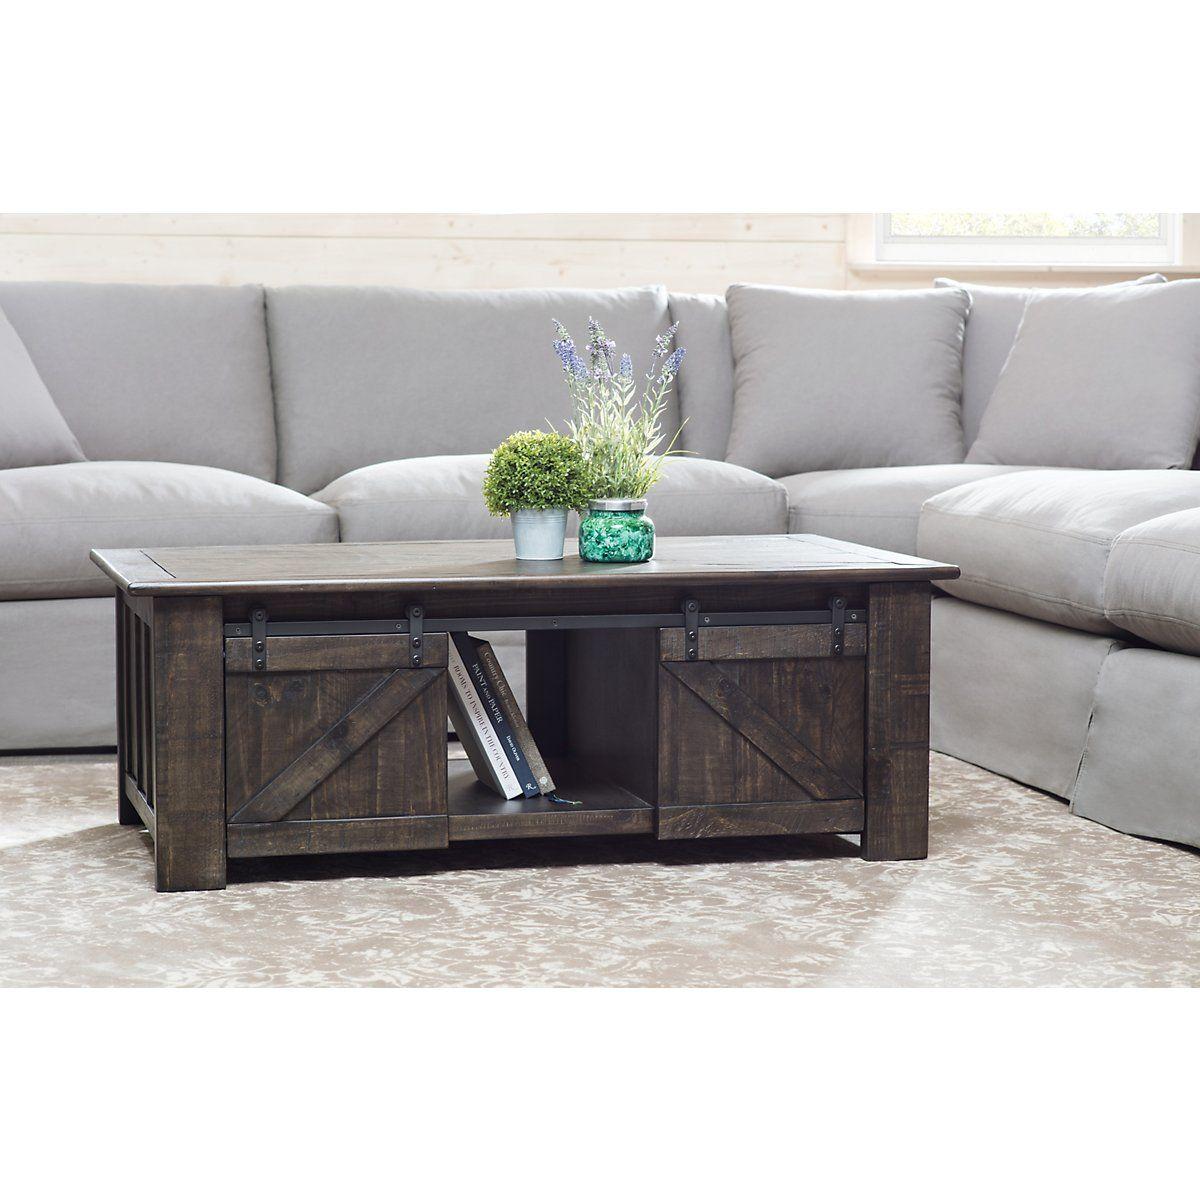 City Furniture Garrett Dark Tone Castored Lift Coffee Table Coffee Table Living Room Coffee Table Living Room Table [ 1200 x 1200 Pixel ]